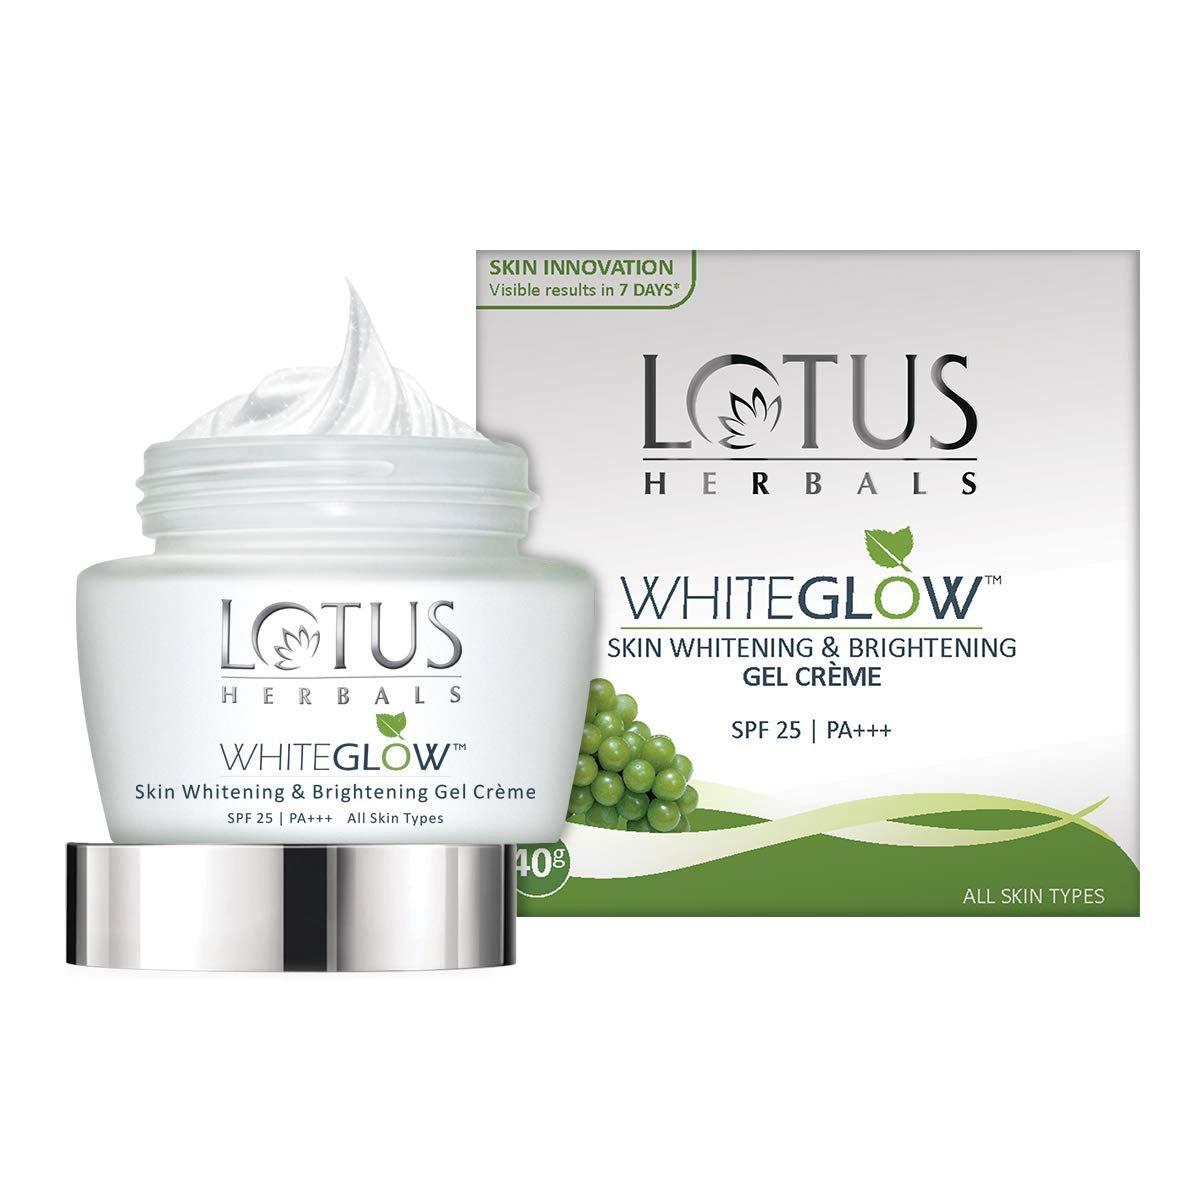 Lotus Herbals WhiteGlow Skin Whitening And Brightening Gel, Face Cream